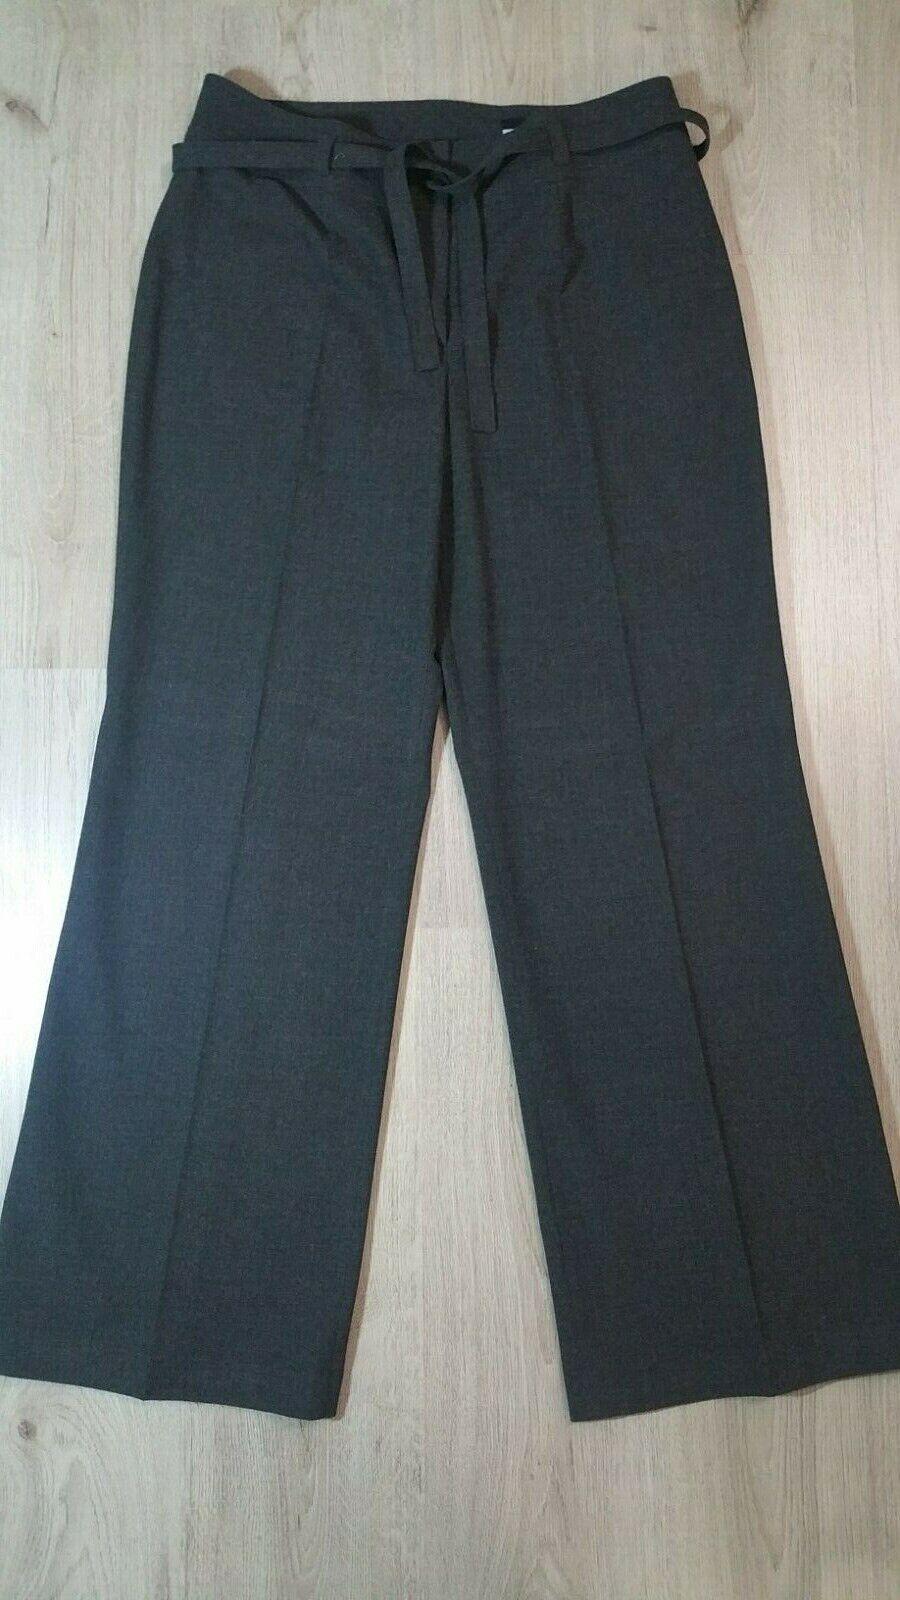 Orwell Damen Hose hochwertig Gr. 42 dunkelgrau